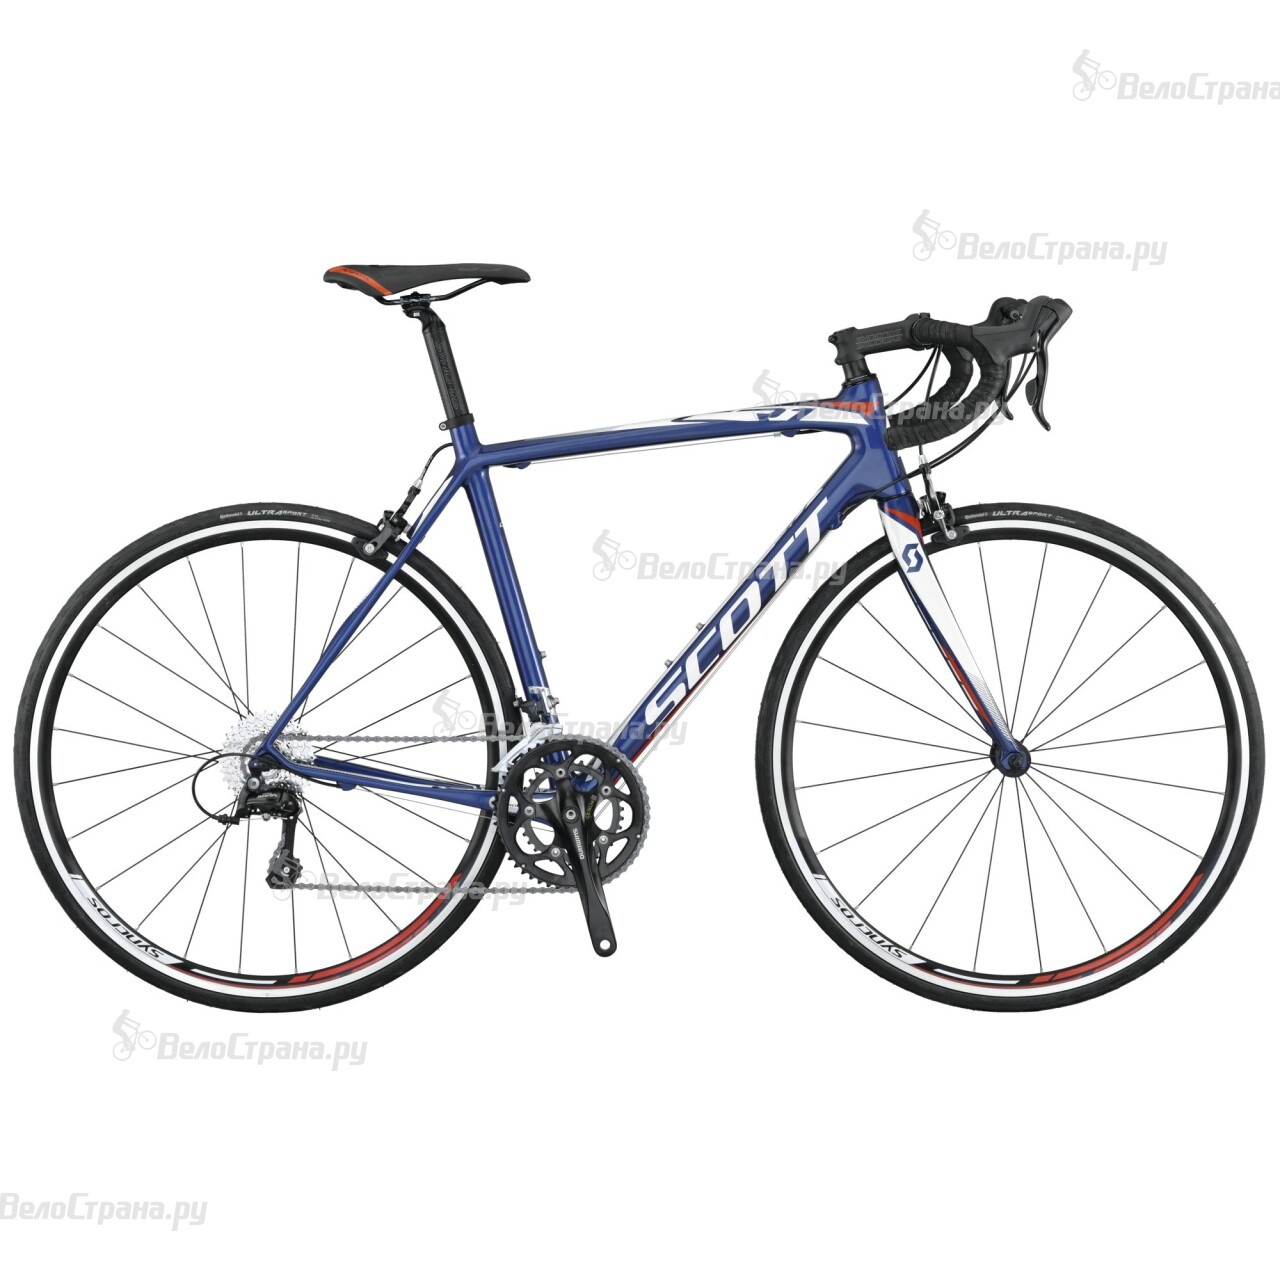 Велосипед Scott CR1 30 (2015) прочие устройства sonance cr1